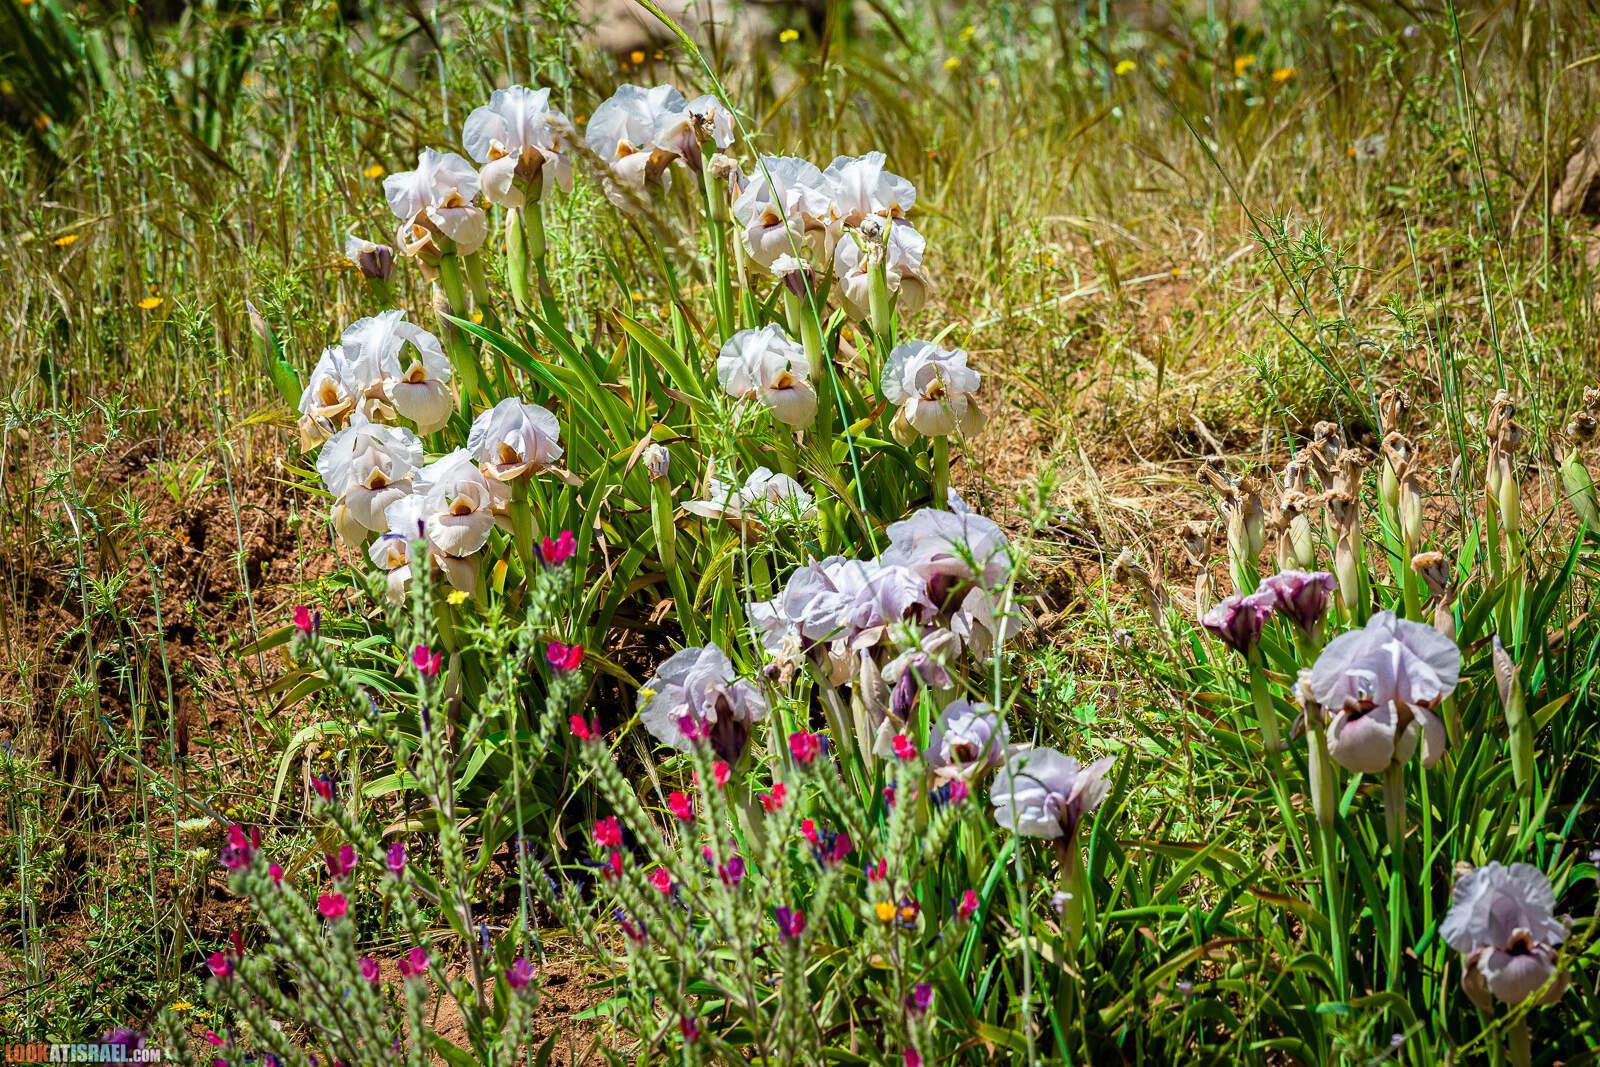 Ирис самарийский - Iris lortetii - אירוס השומרון - LookAtIsrael.com - Фото путешествия по Израилю